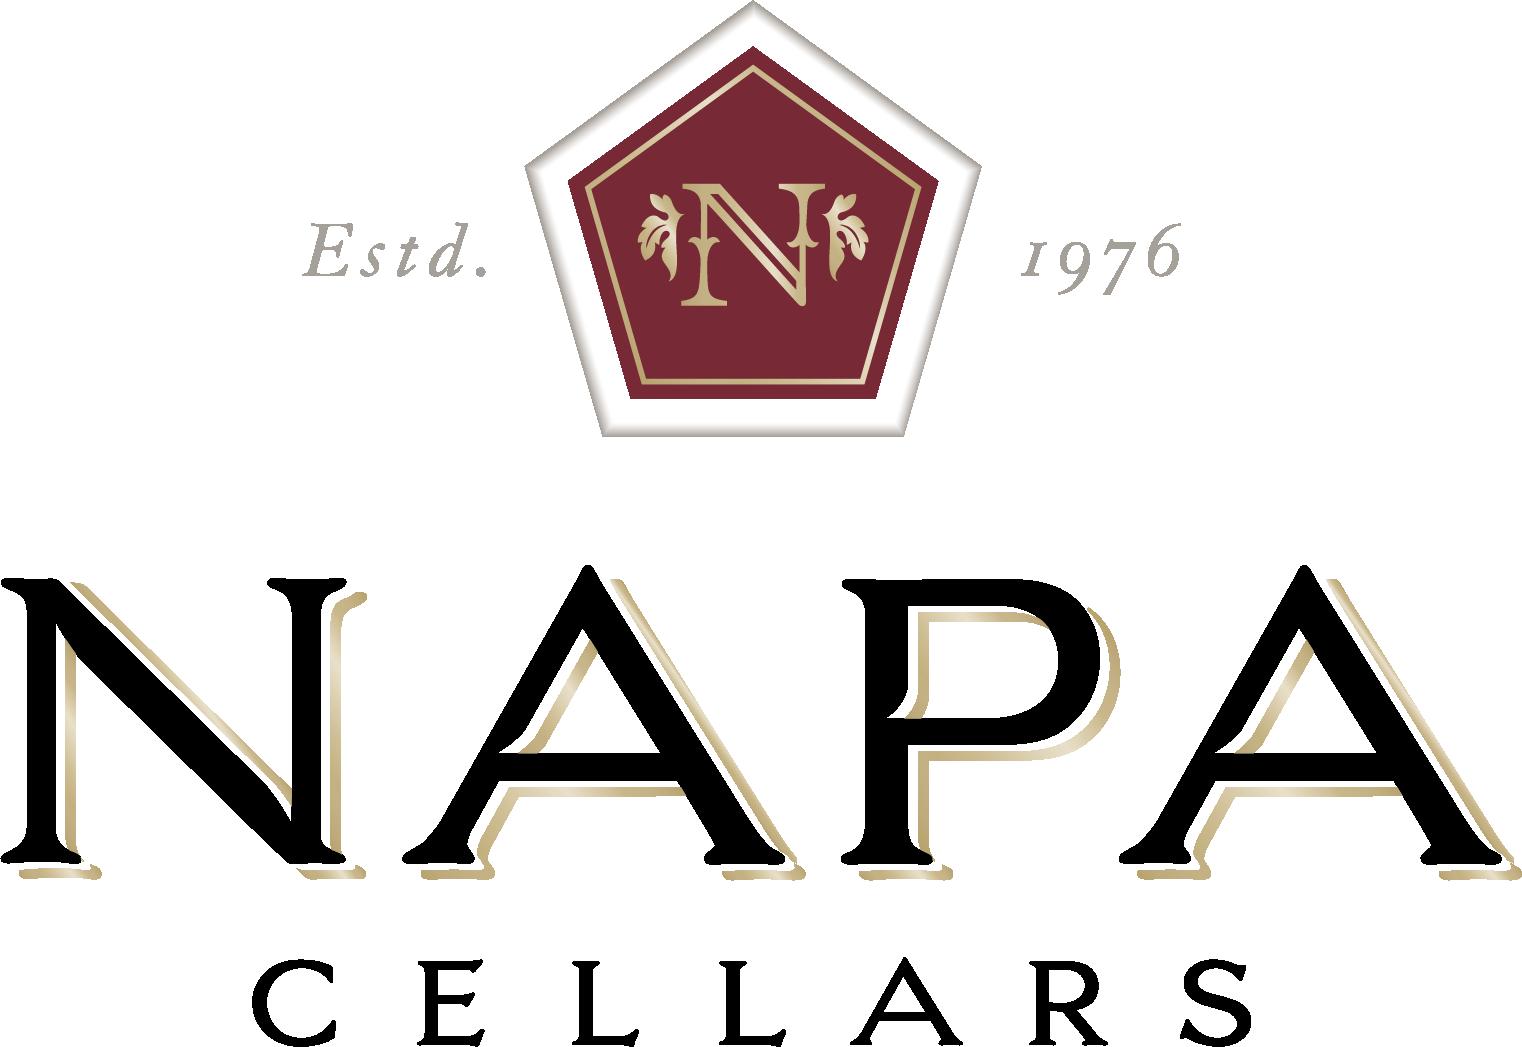 Image: Napa Cellars